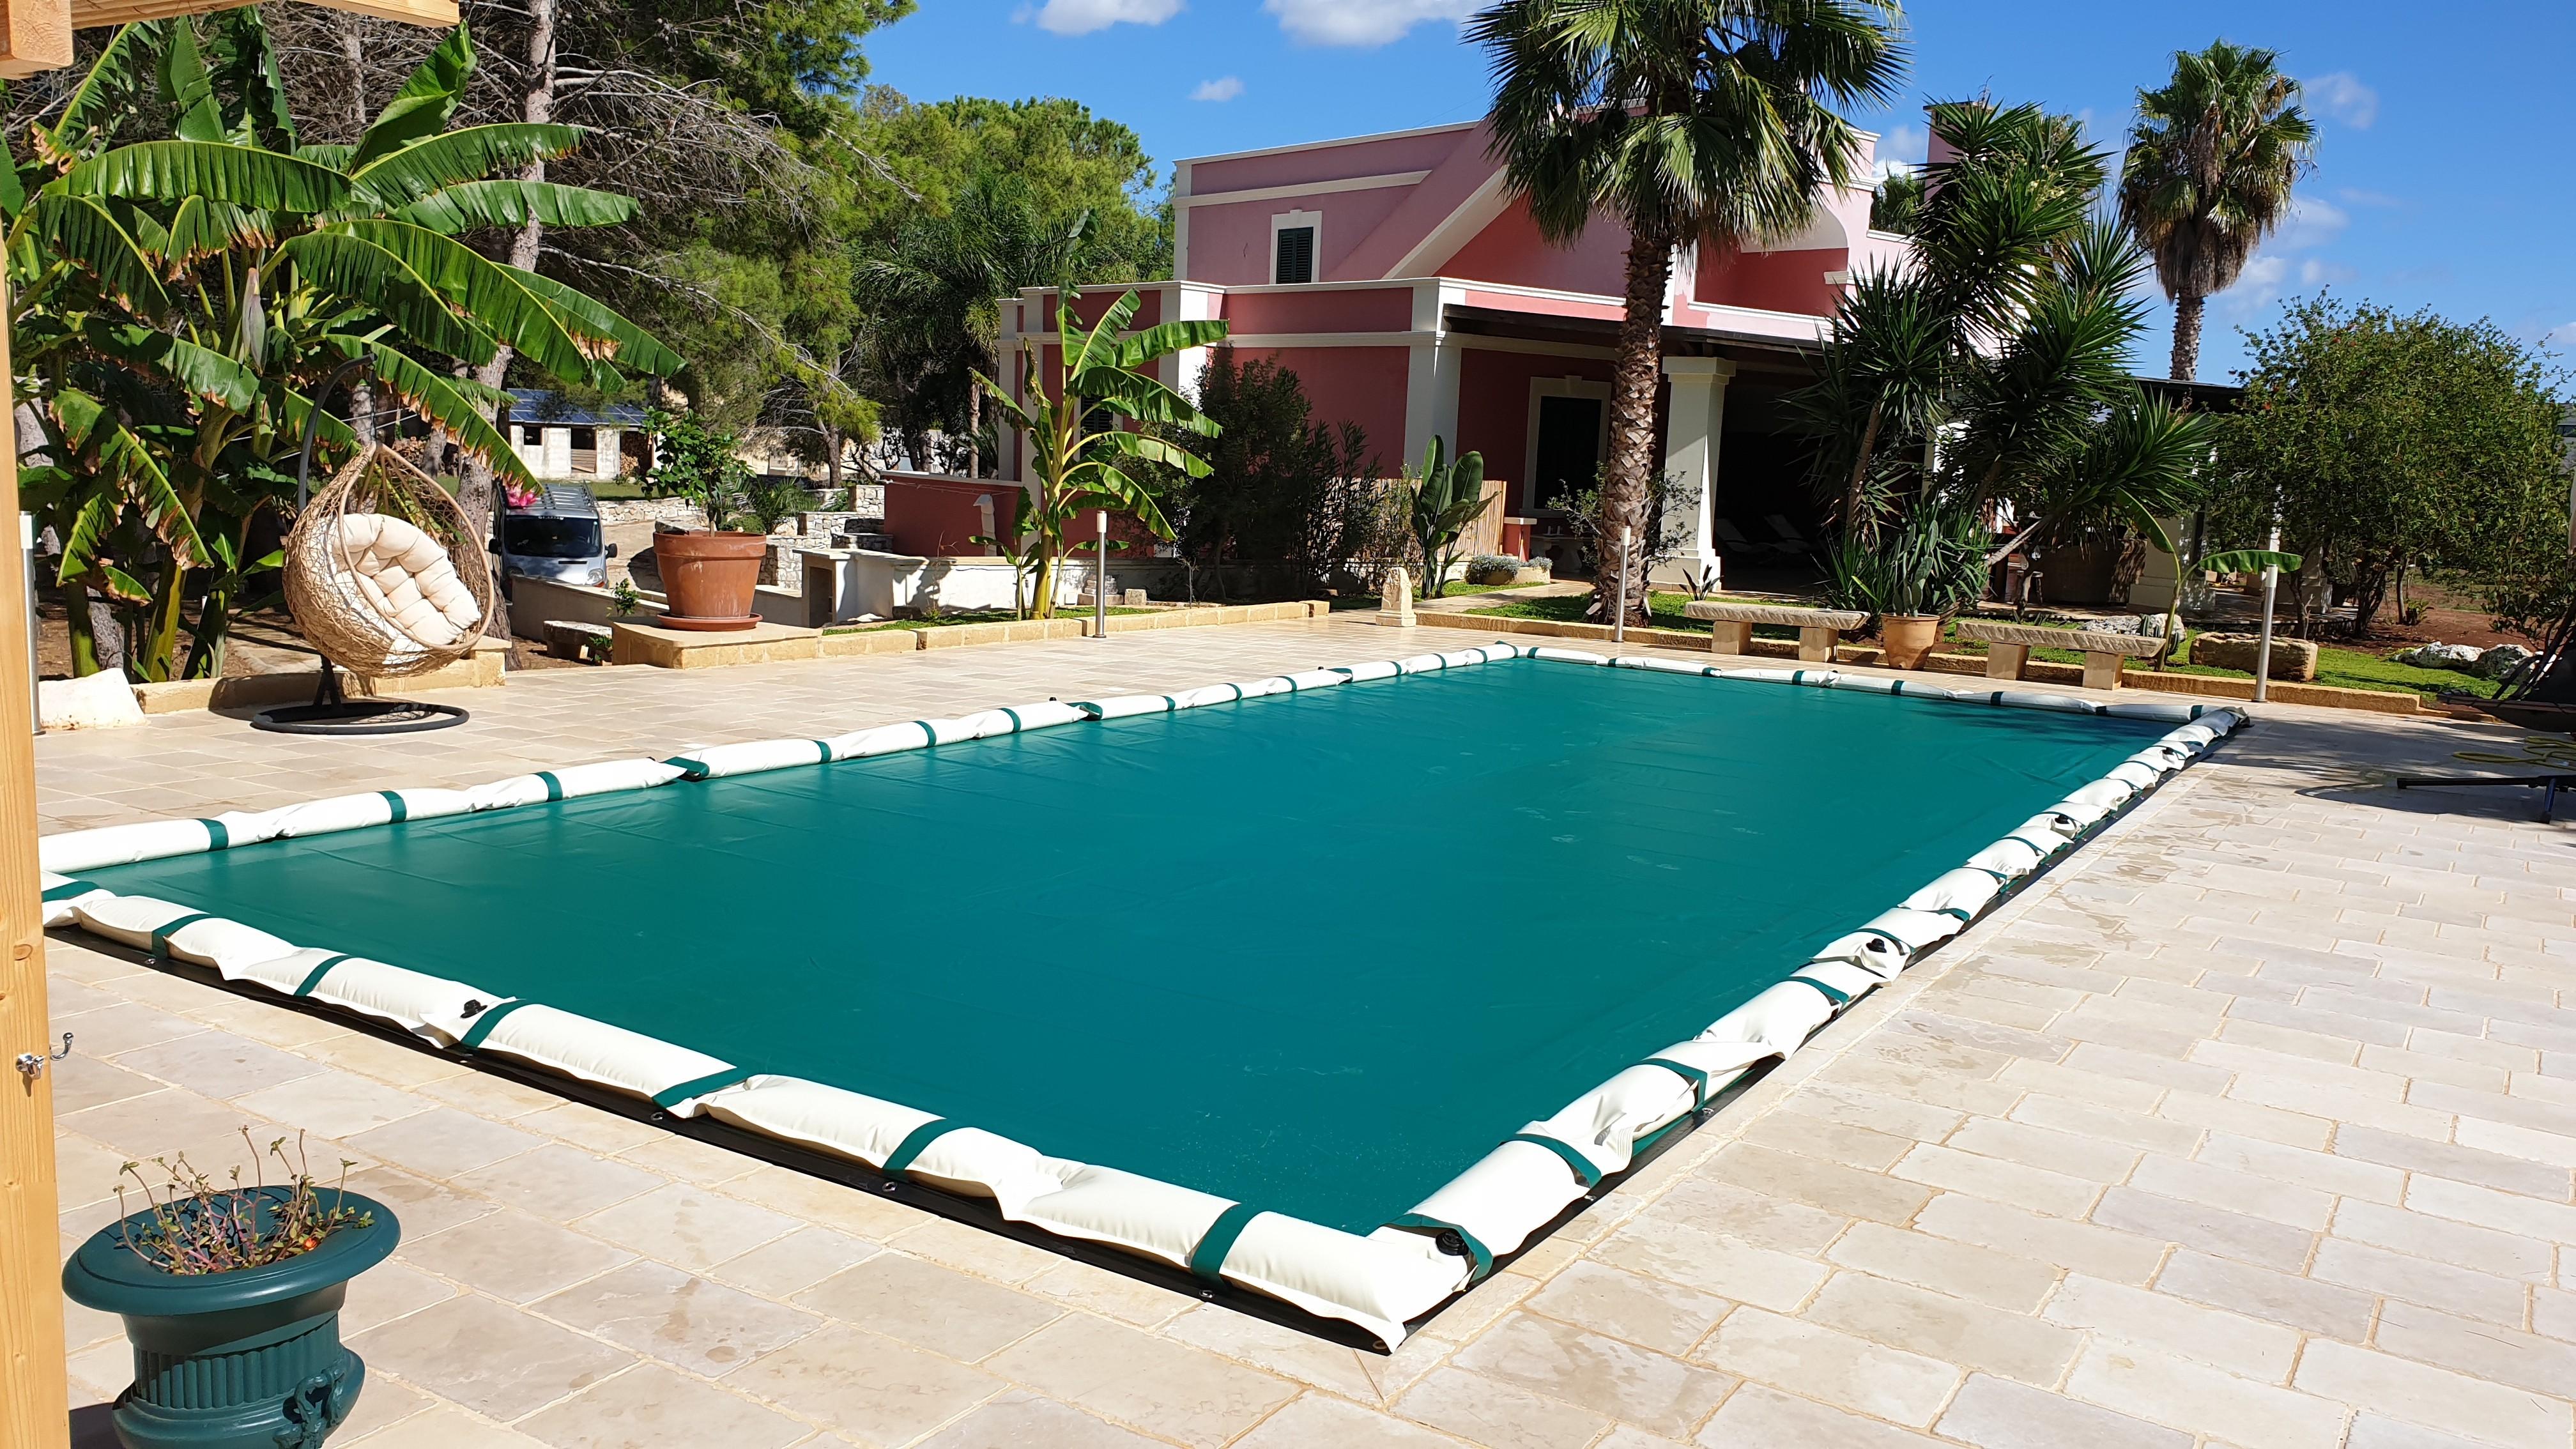 Telo copertura invernale per piscina